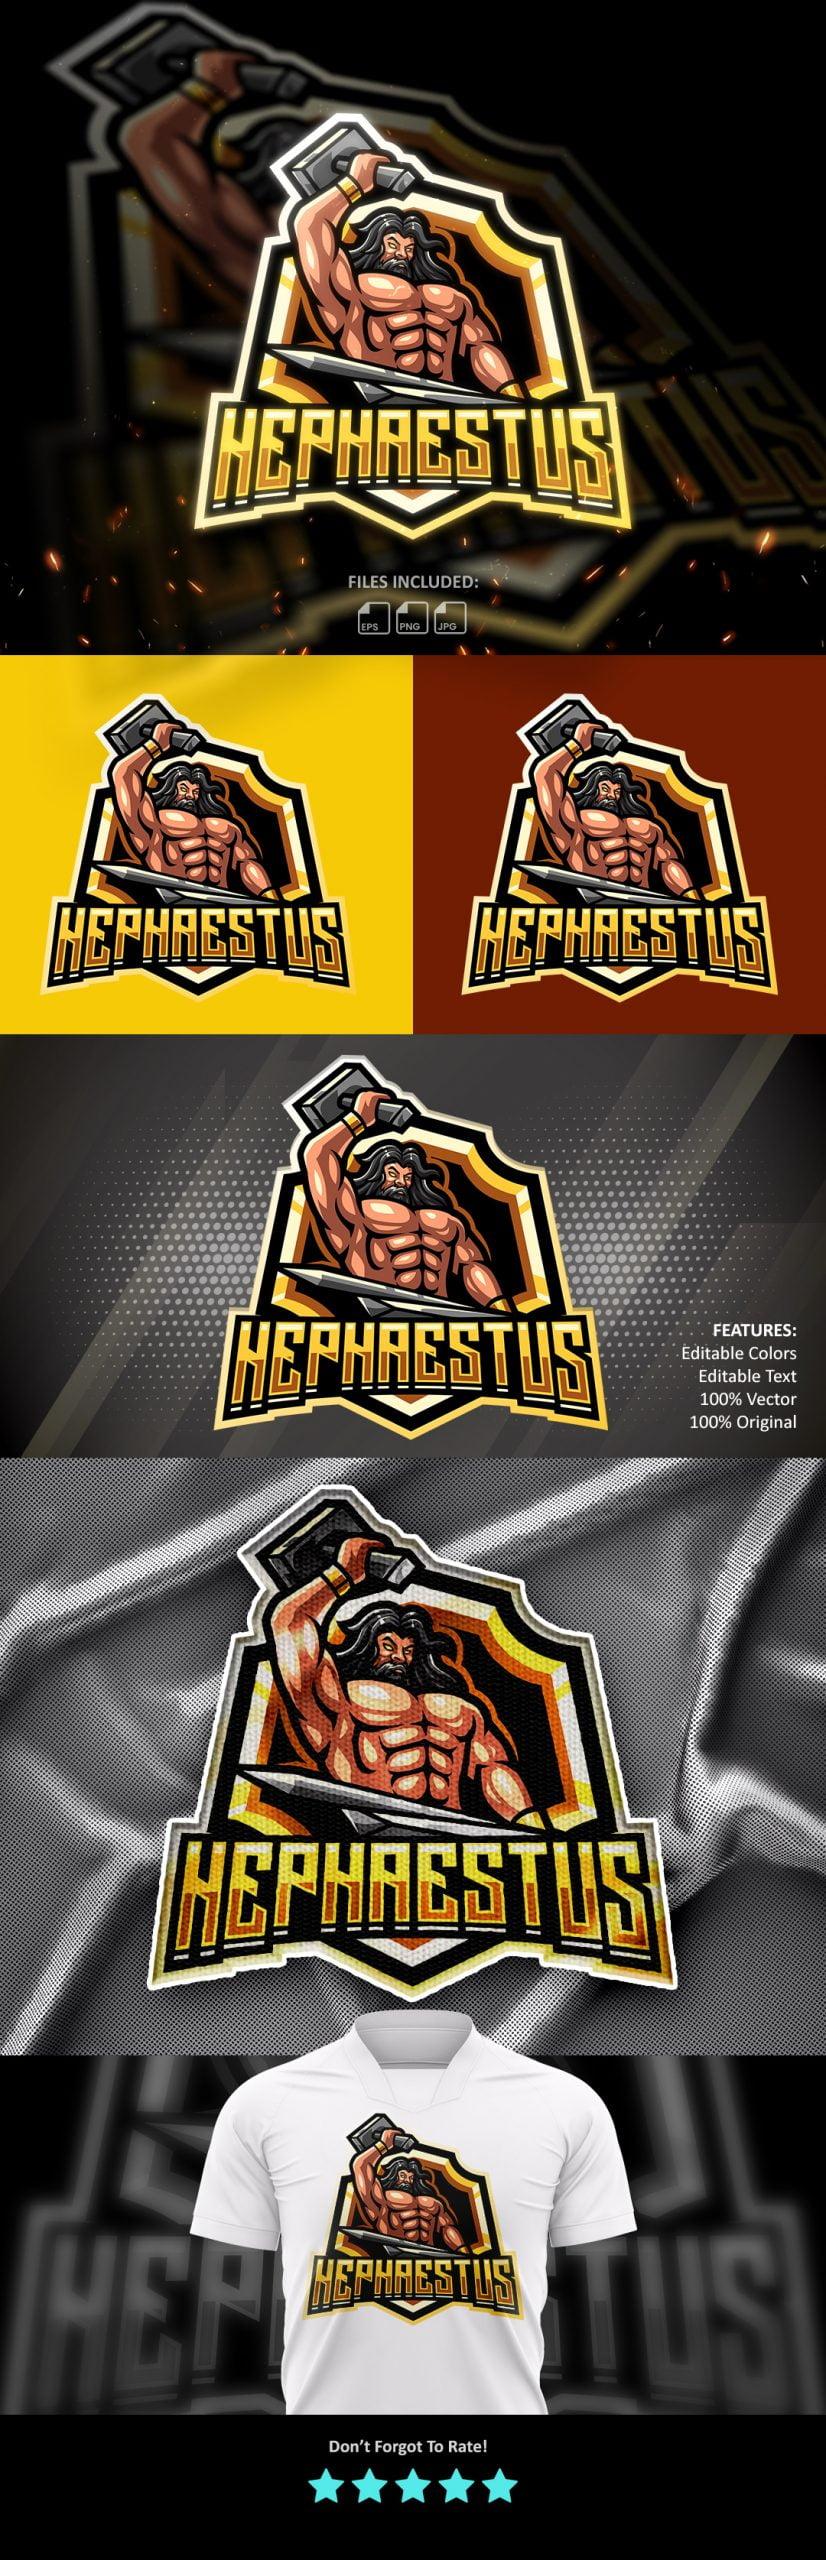 Free-Hephaestus-Mascot-Logo-Download